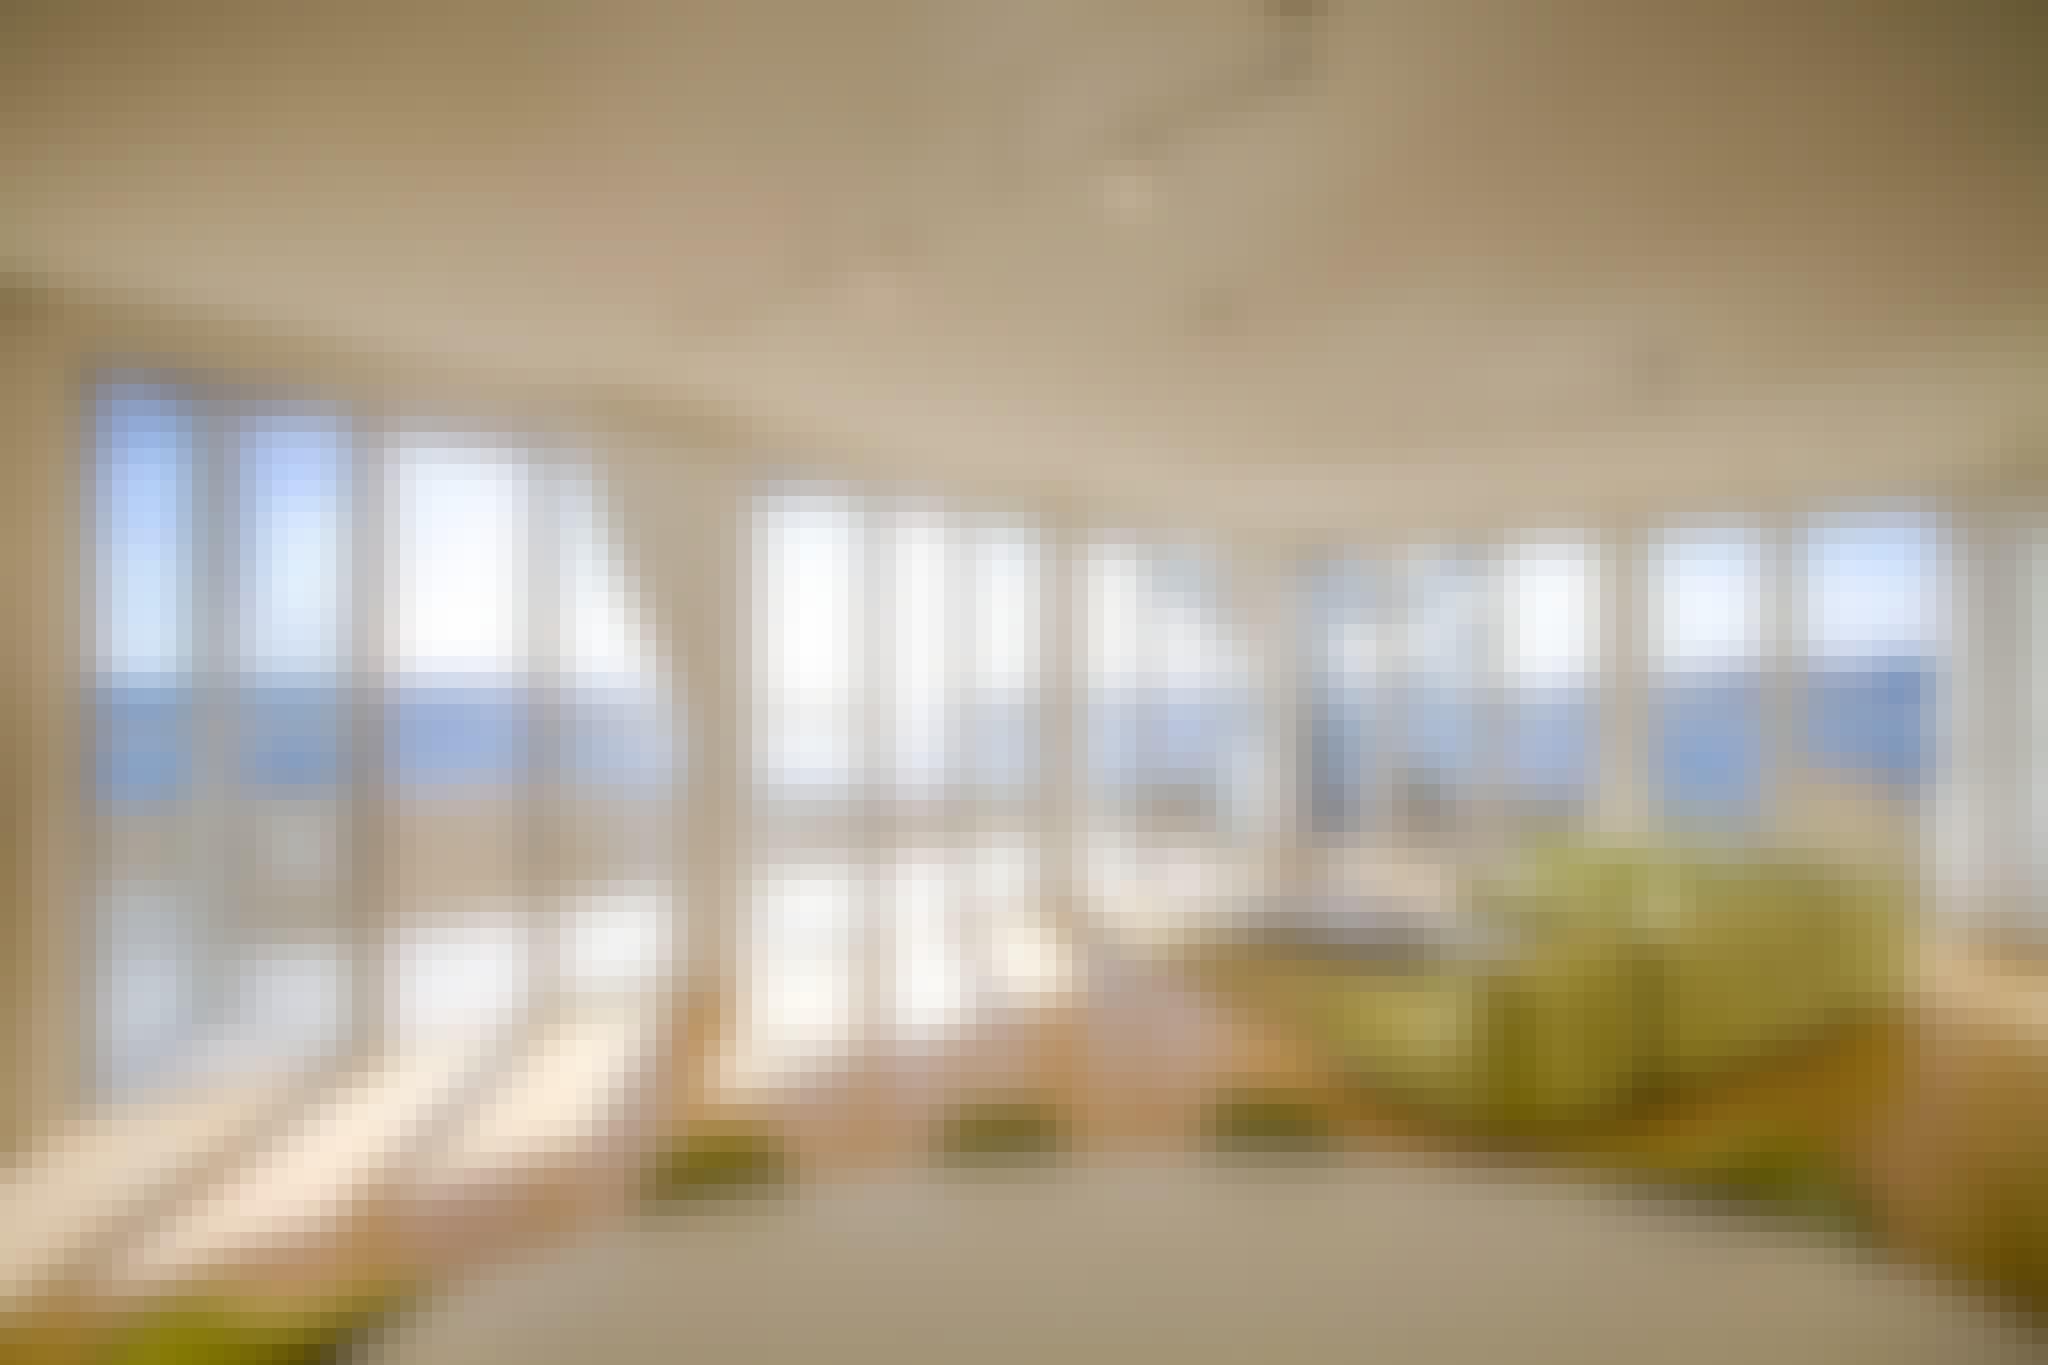 panoramic views through residential glass walls